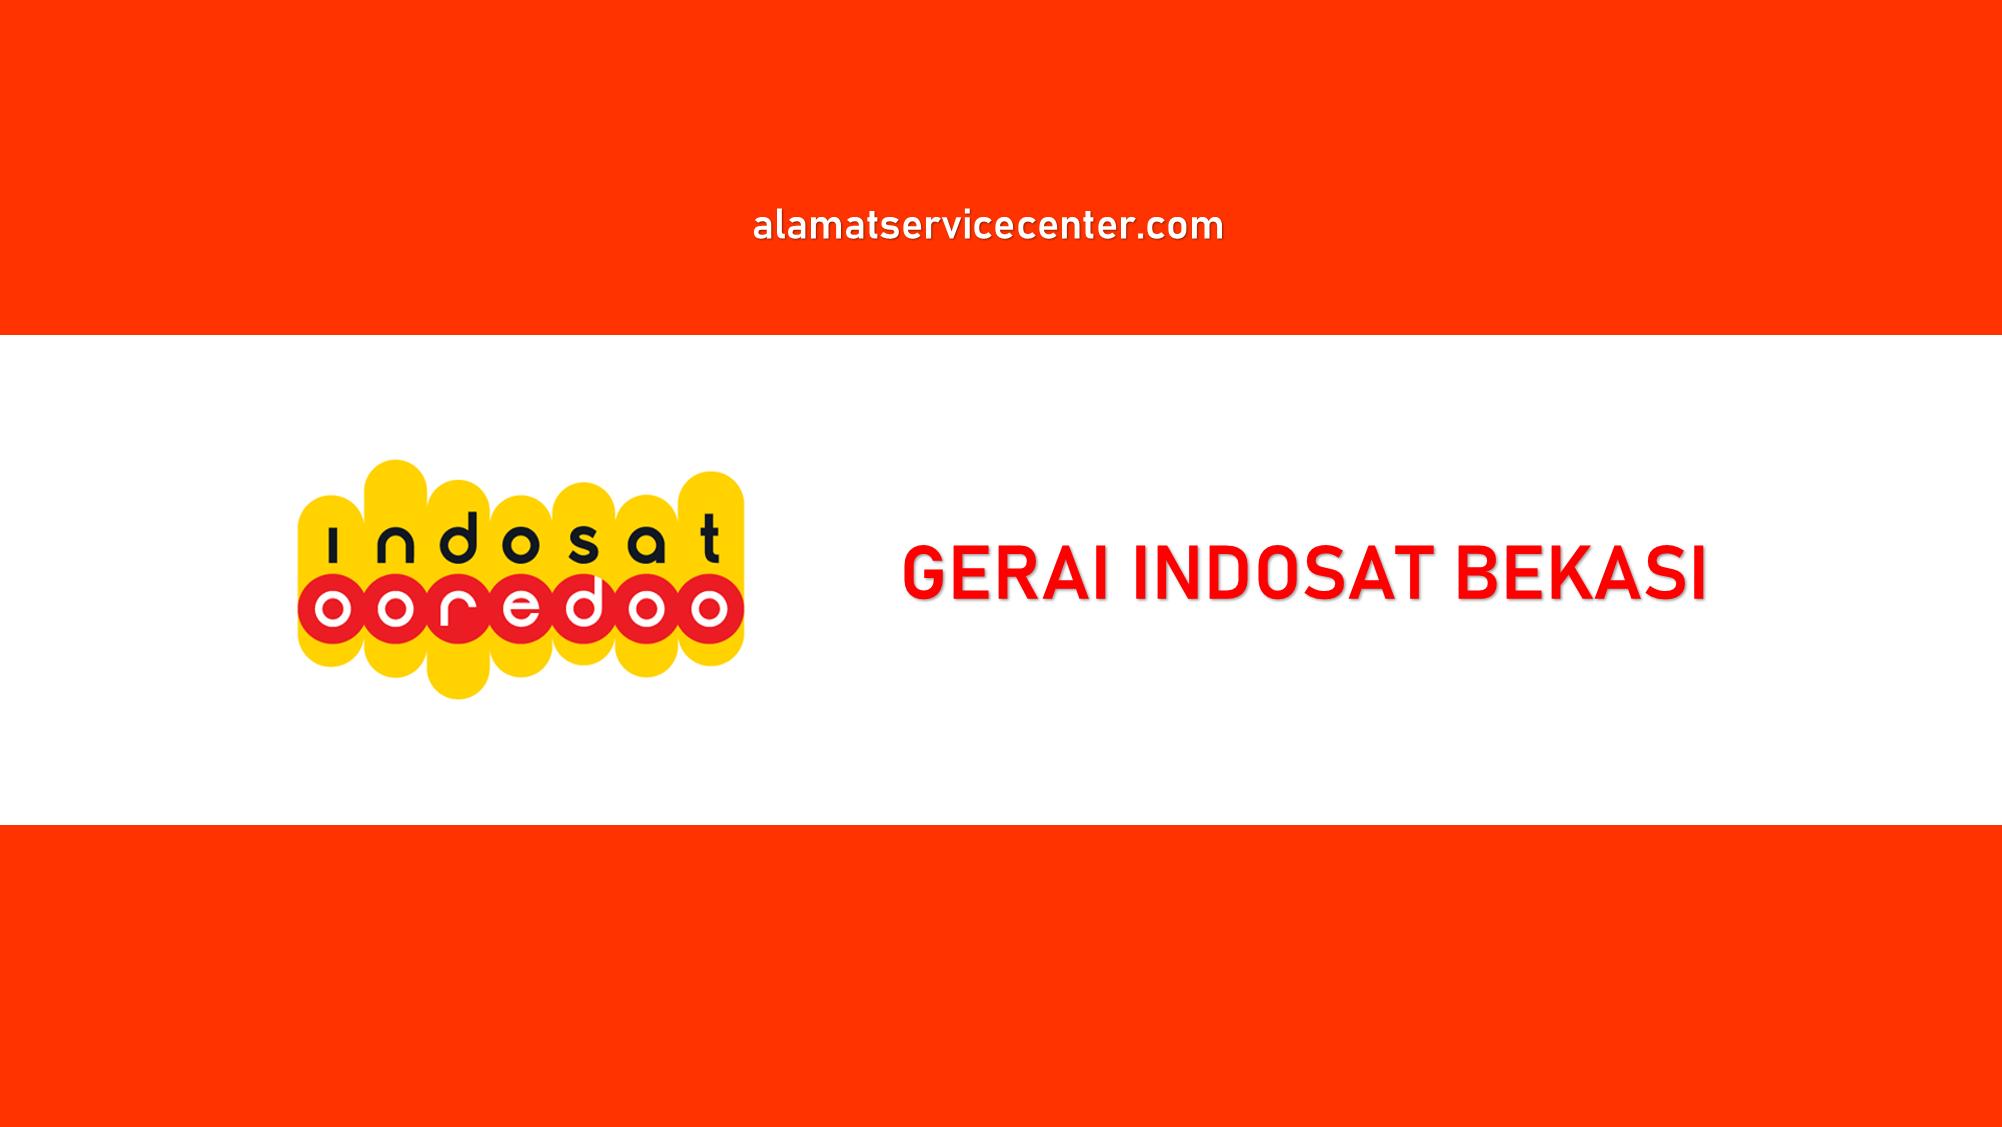 Gerai Indosat Bekasi